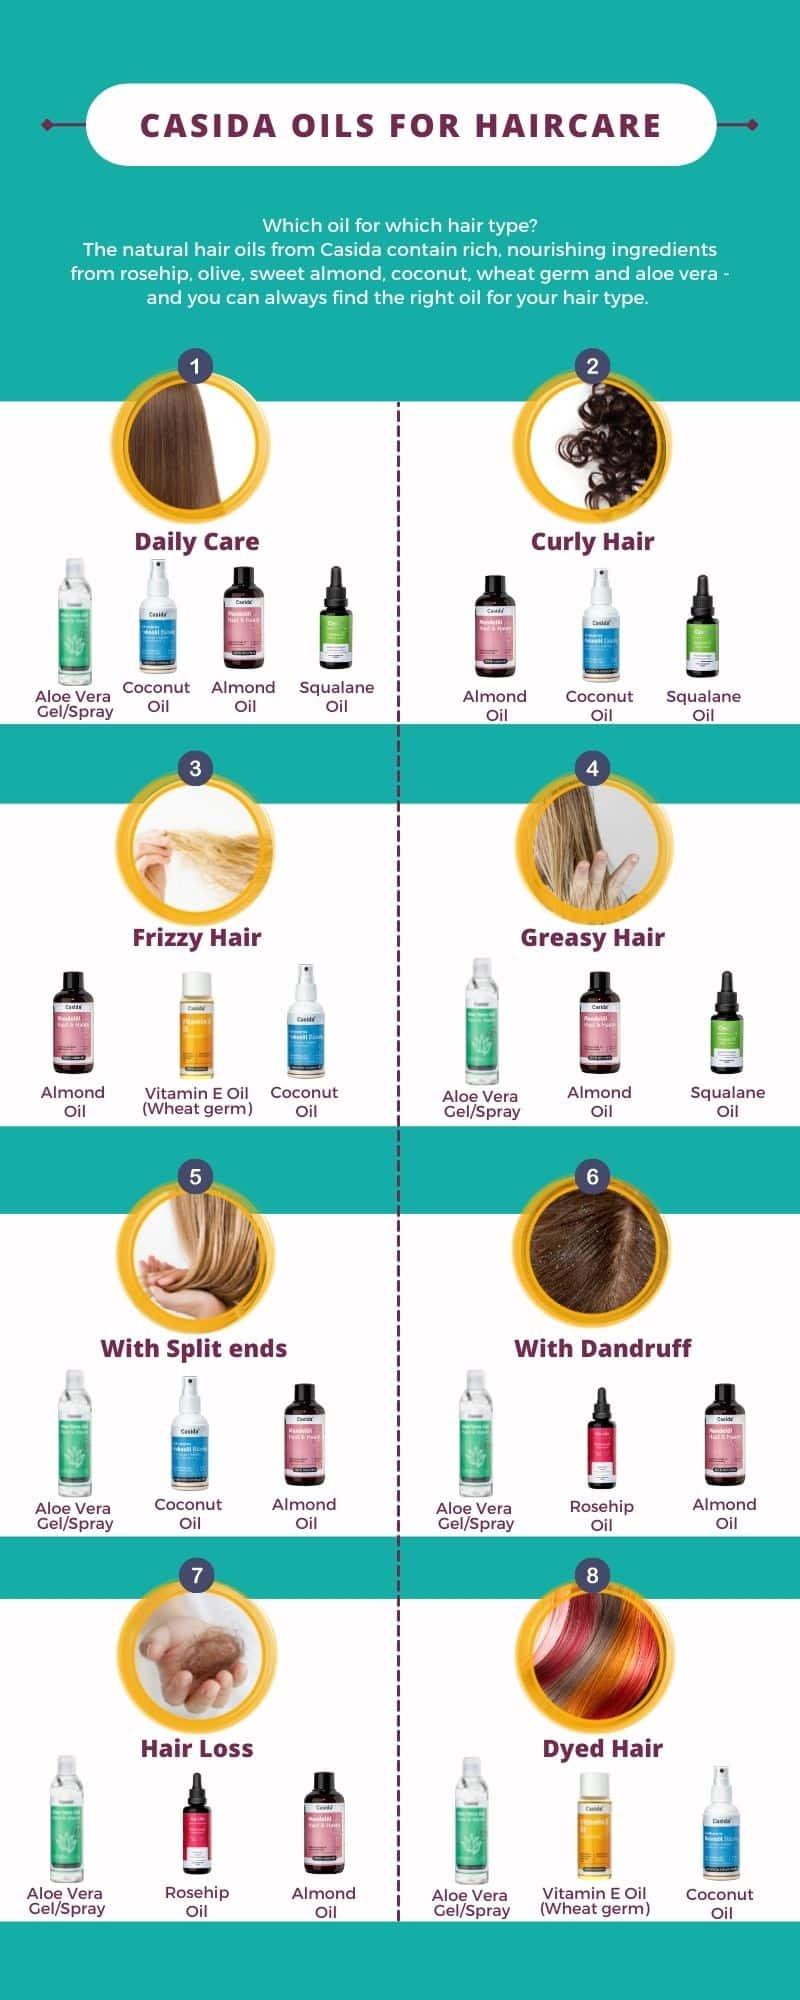 Casida Oils for Haircare rosehip, olive, sweet almond, coconut, wheat germ aloe vera